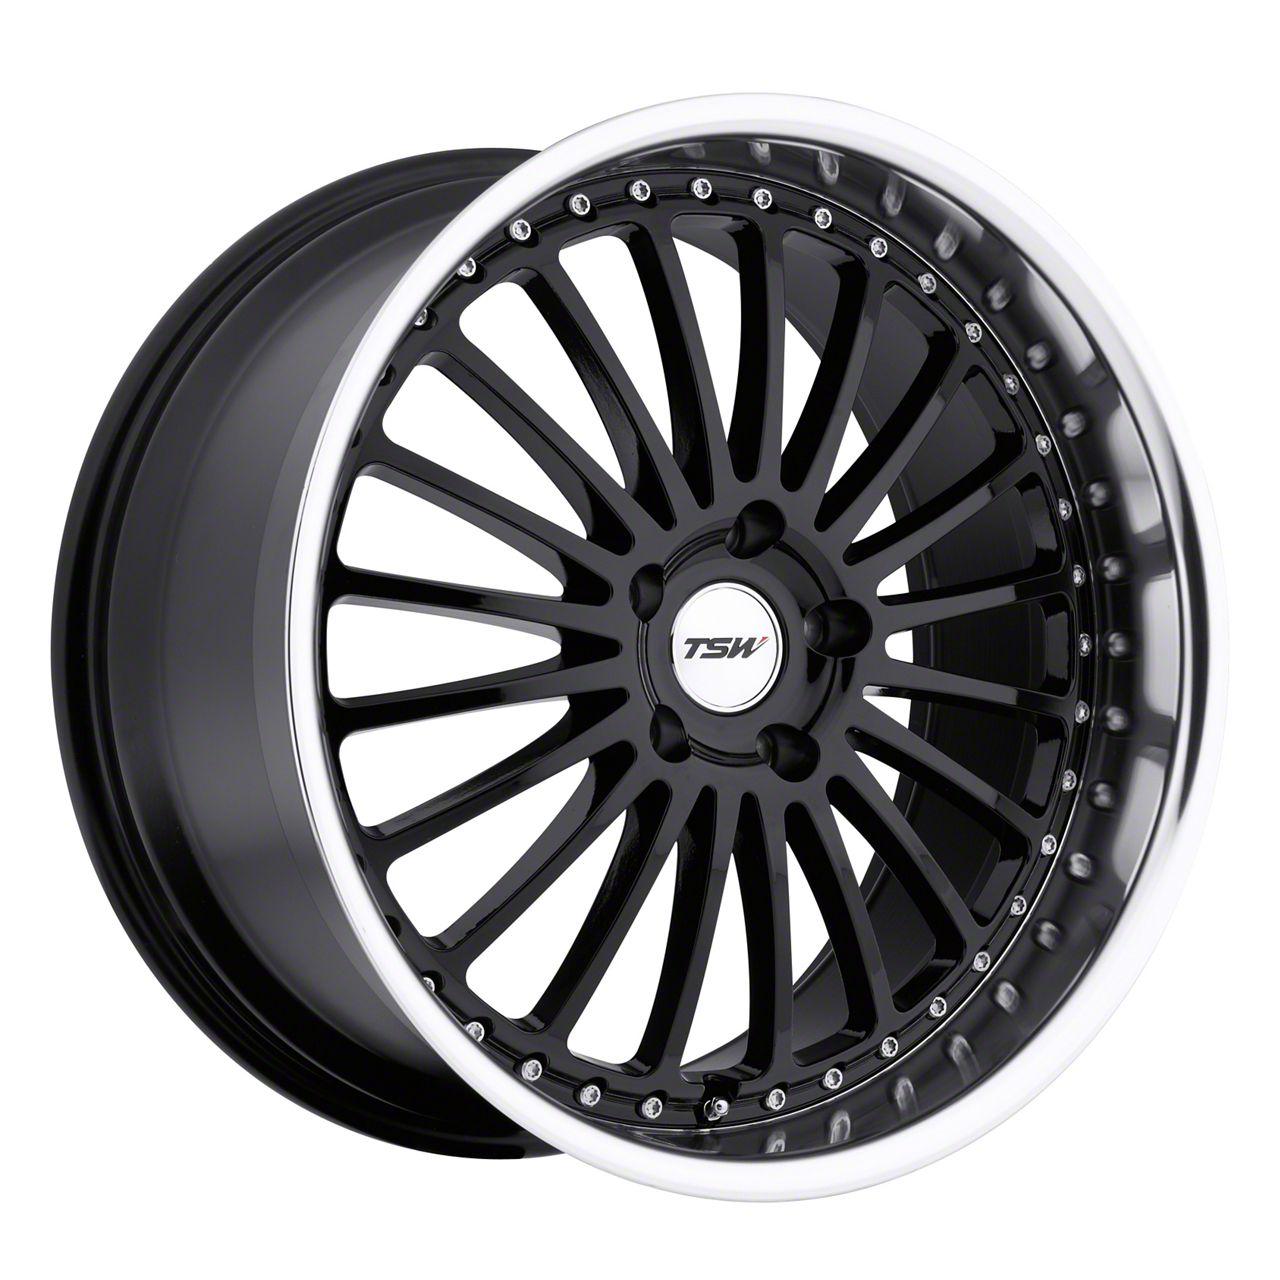 TSW Silverstone Gloss Black w/ Mirror Cut Lip Wheel - 20x10 (15-19 GT, EcoBoost, V6)